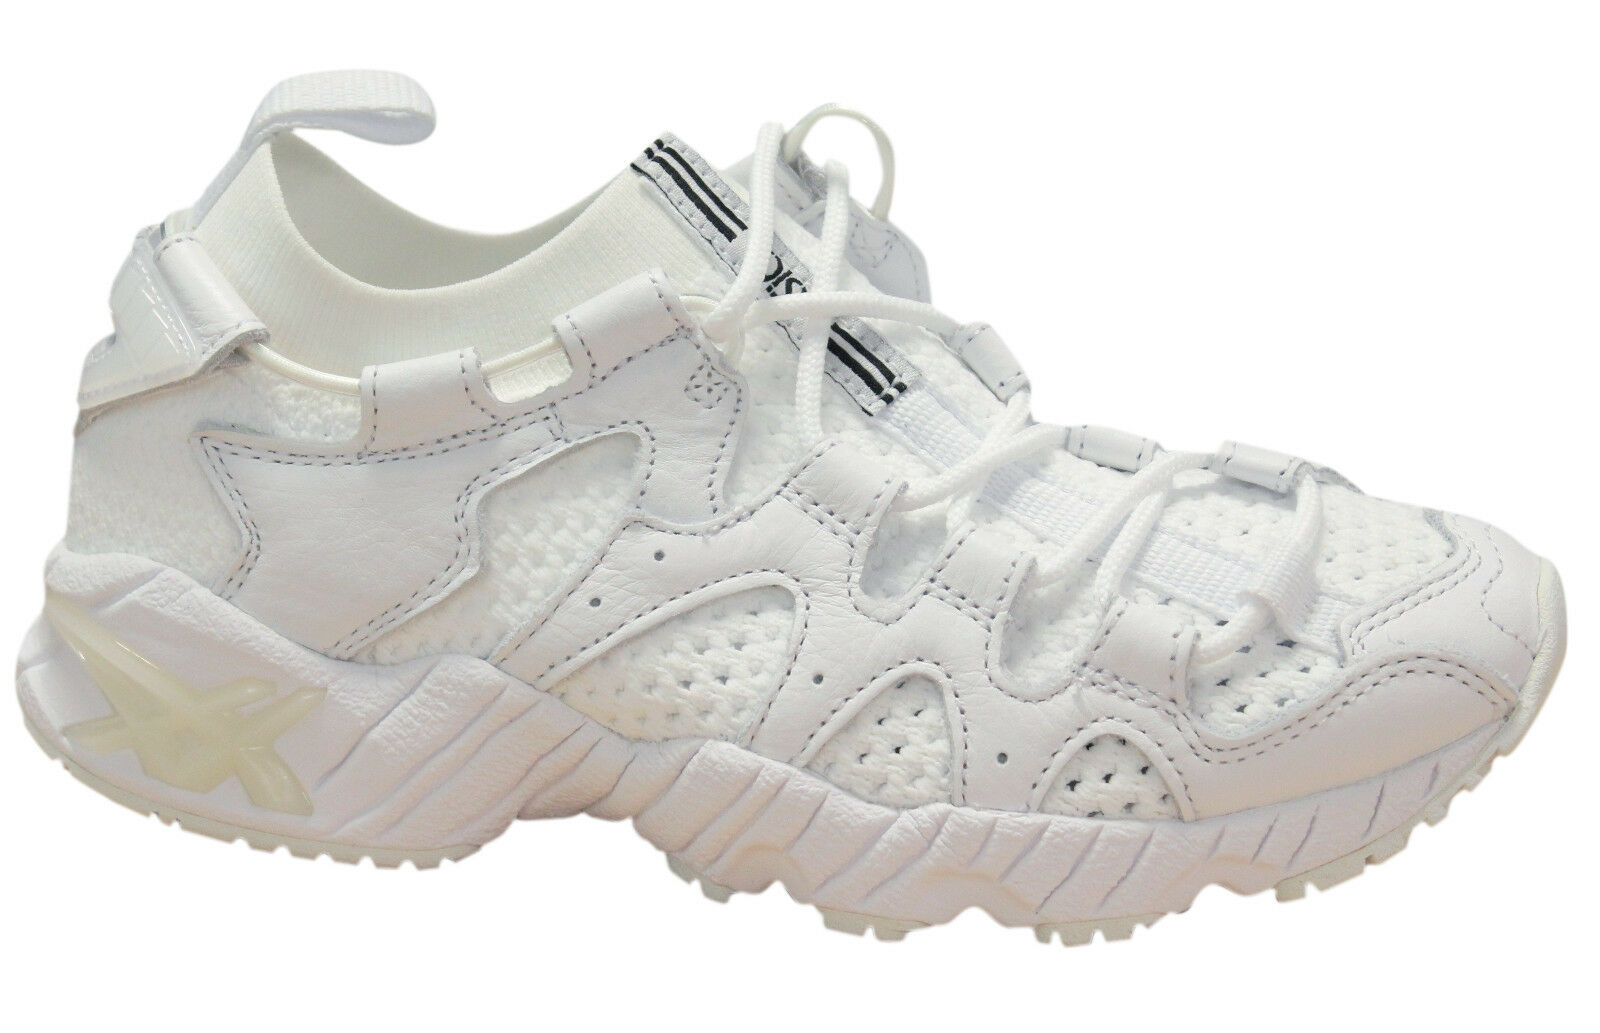 Asics Gel-Mai Knit   Herren Trainers Lace Up Sock Style Schuhe Weiß H8G3N 0101 U13